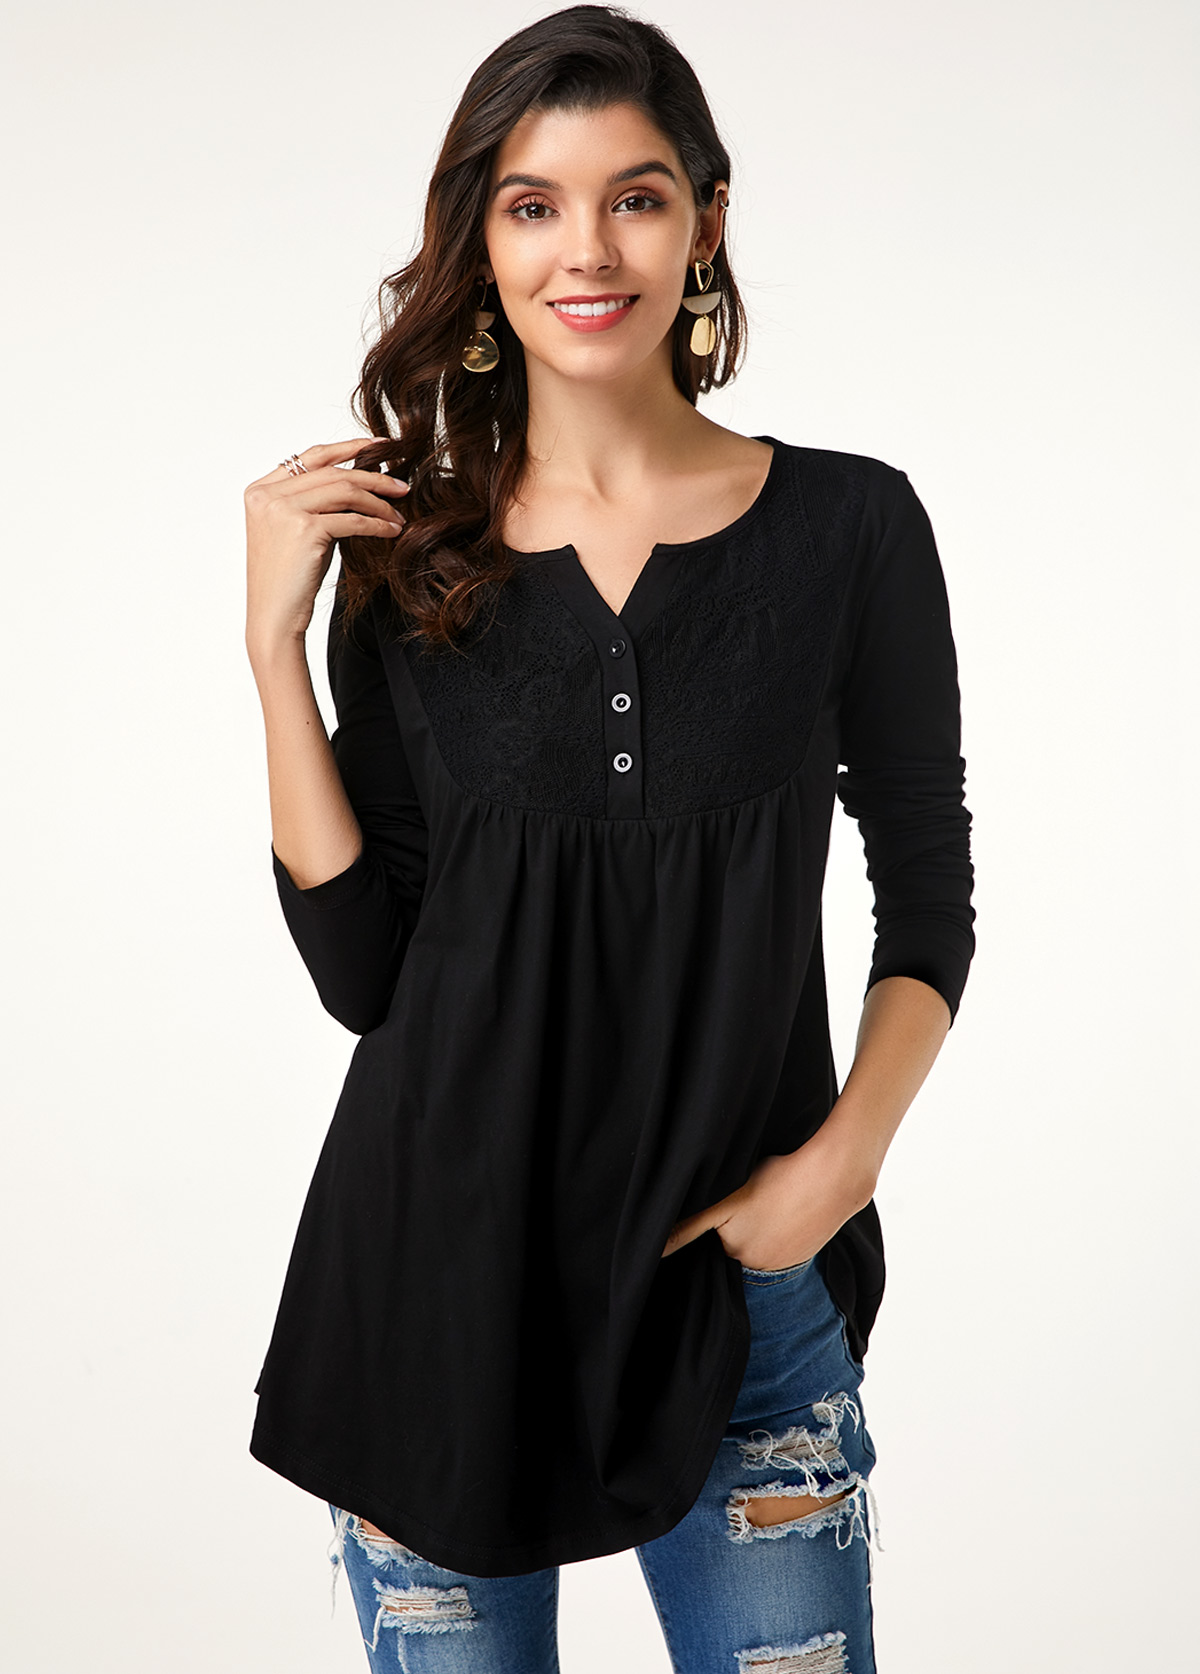 Lace Stitching Long Sleeve Button Up T Shirt